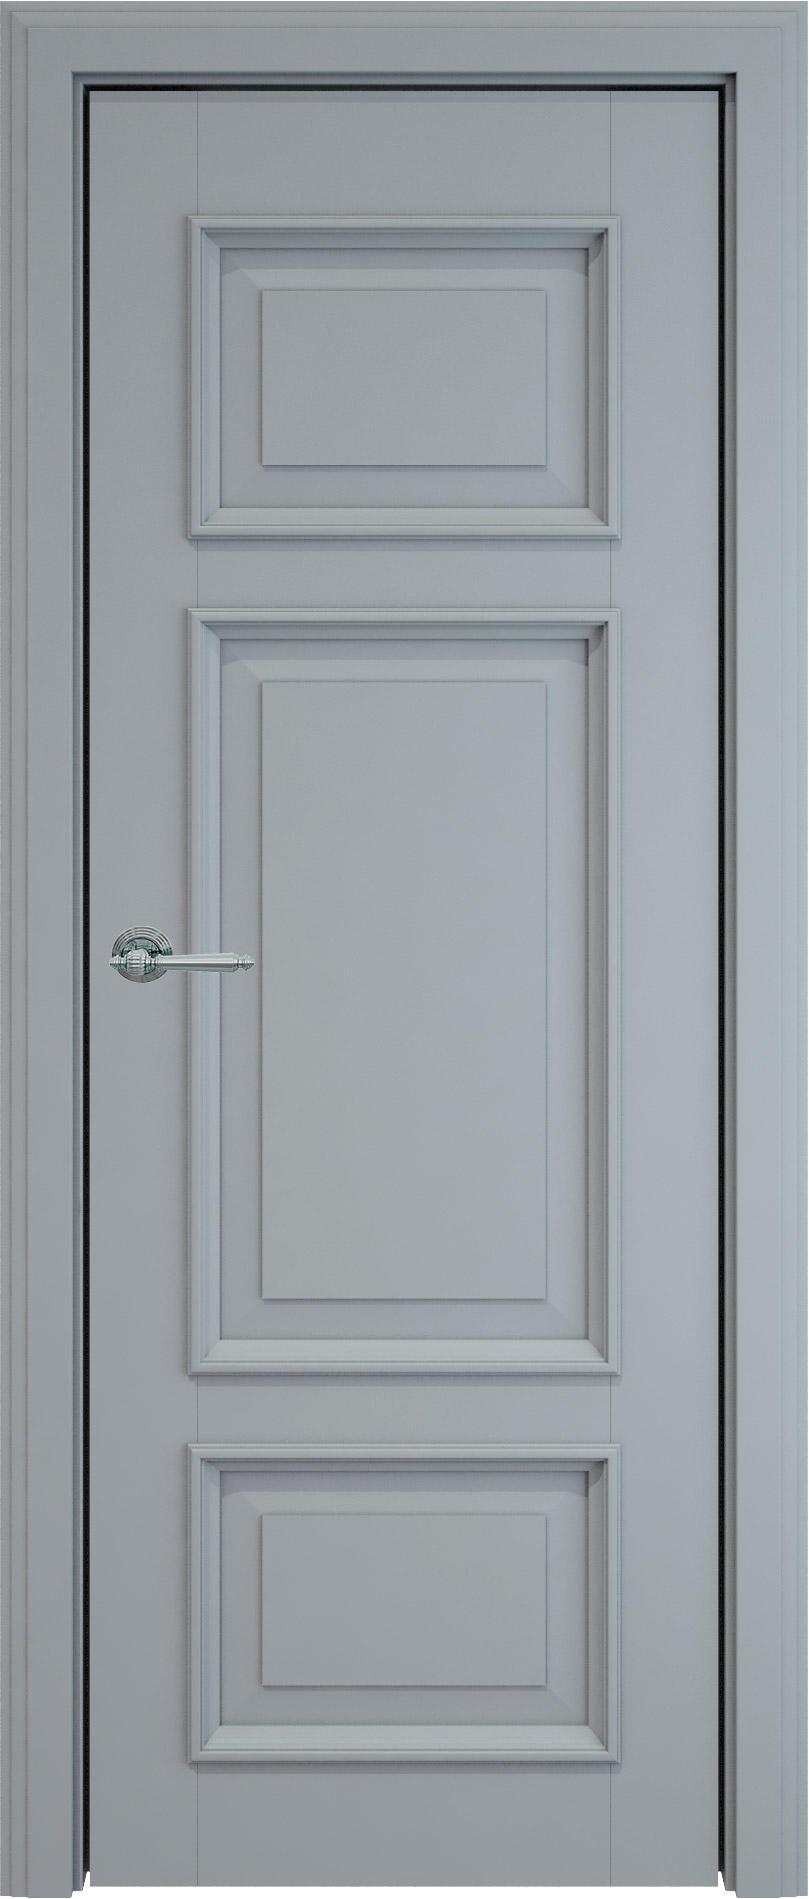 Siena LUX цвет - Серебристо-серая эмаль (RAL 7045) Без стекла (ДГ)